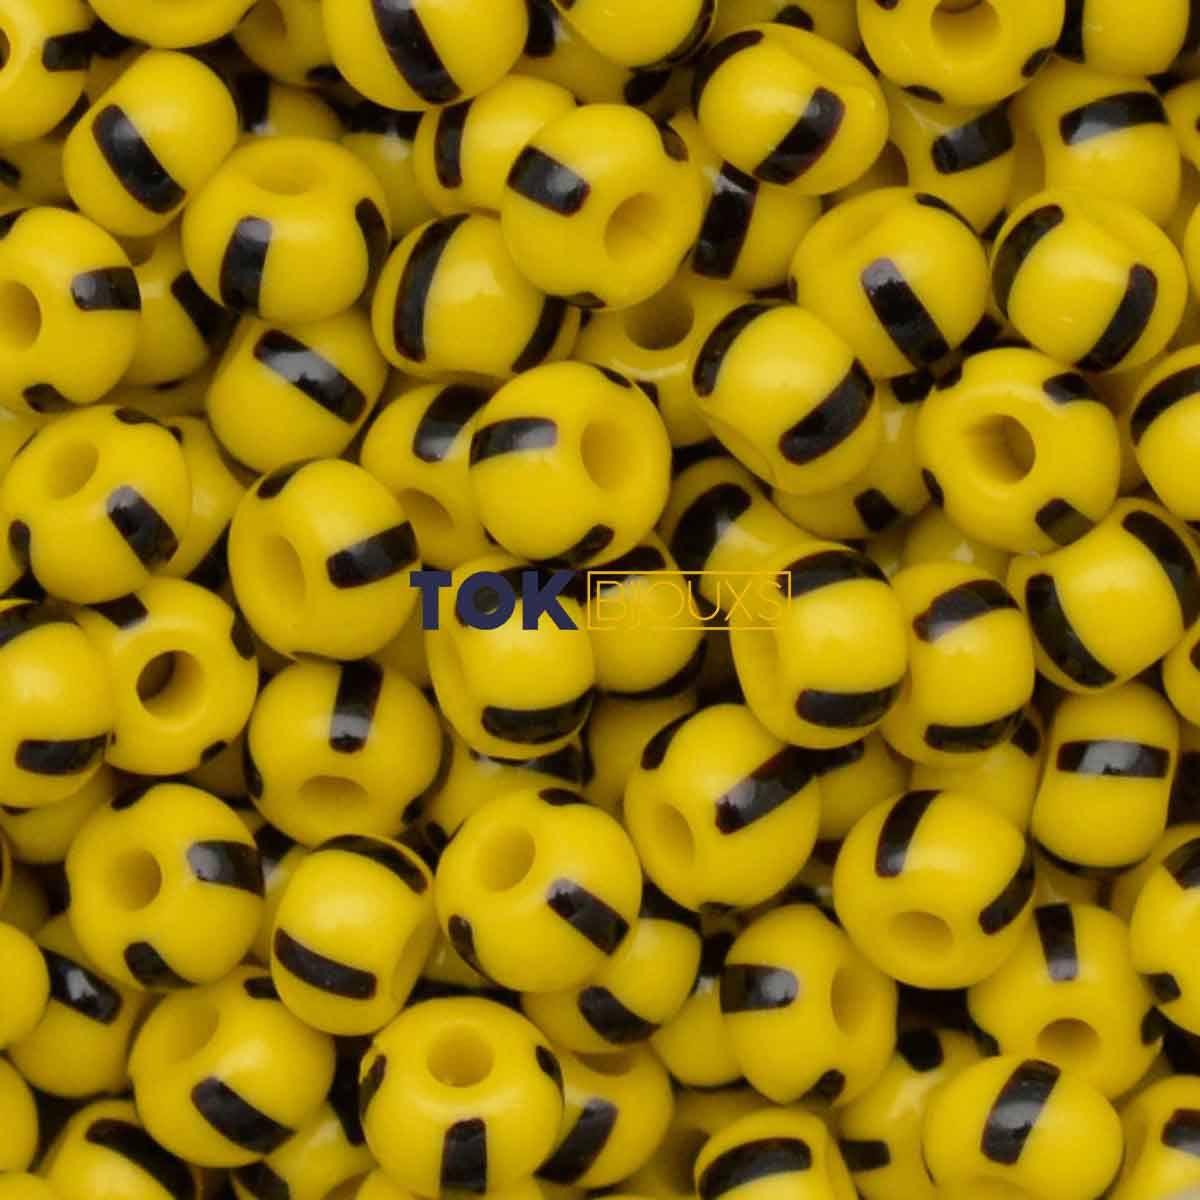 Missangão Rajado Jablonex - Amarelo / Preto - 25g